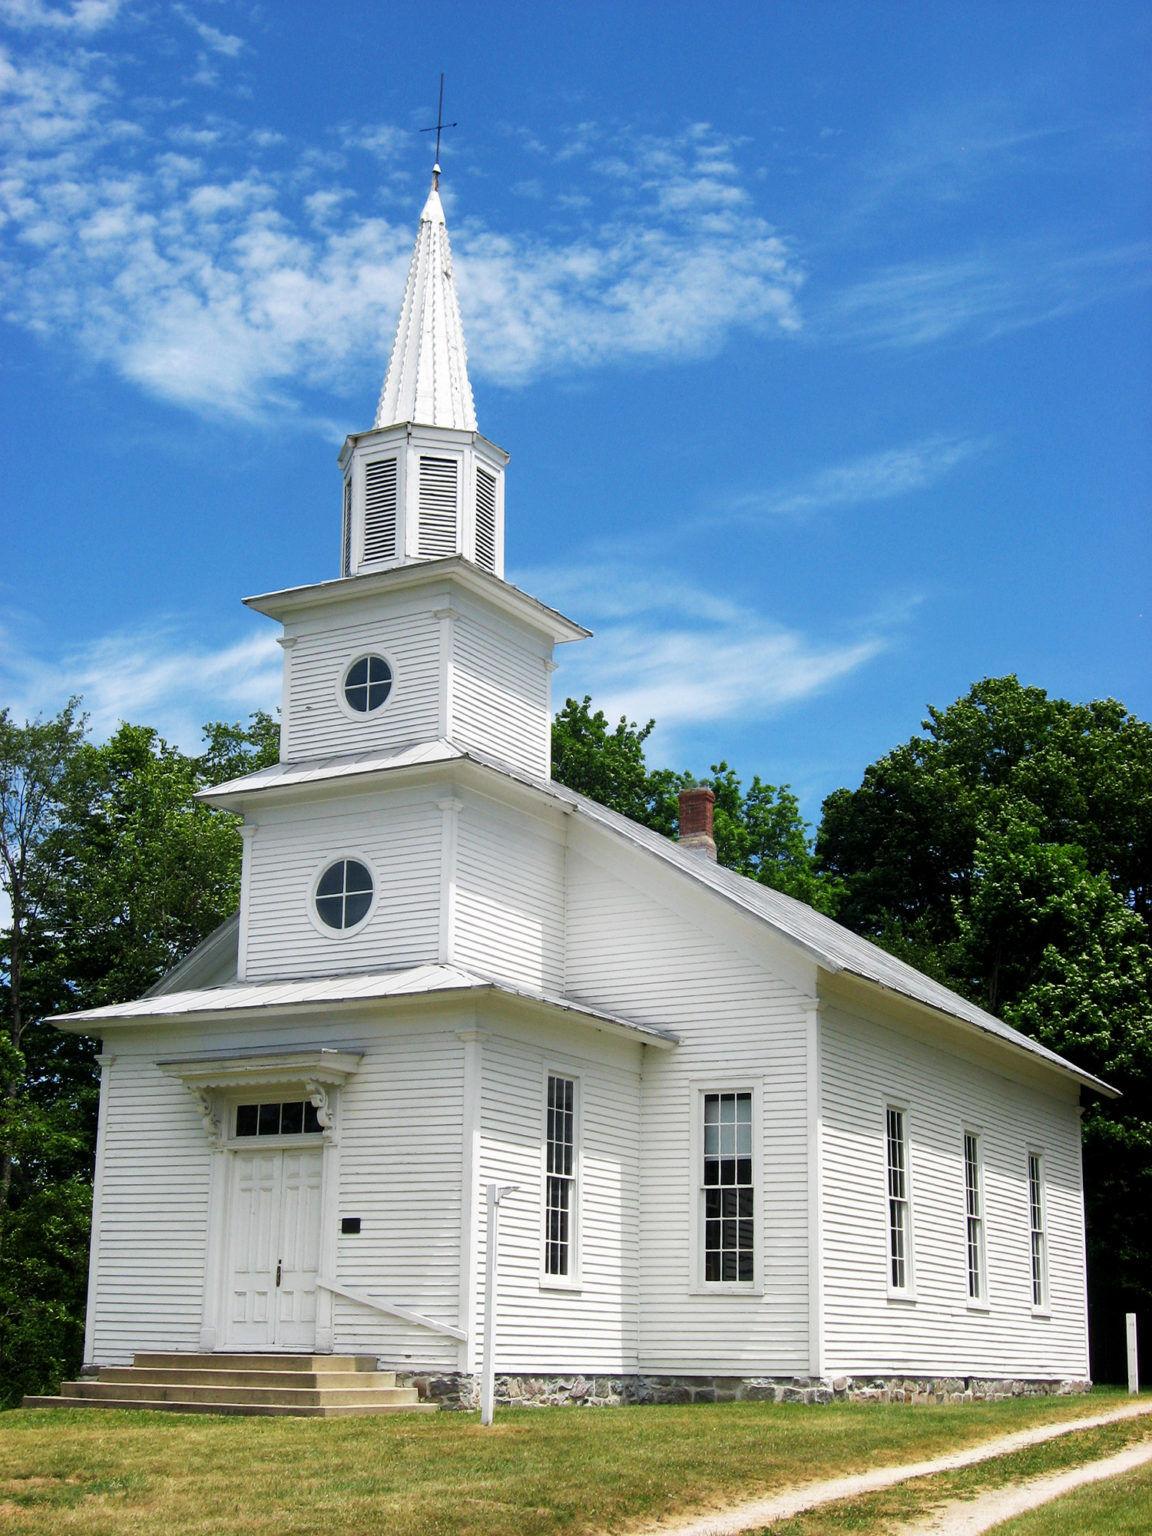 The Powers Church